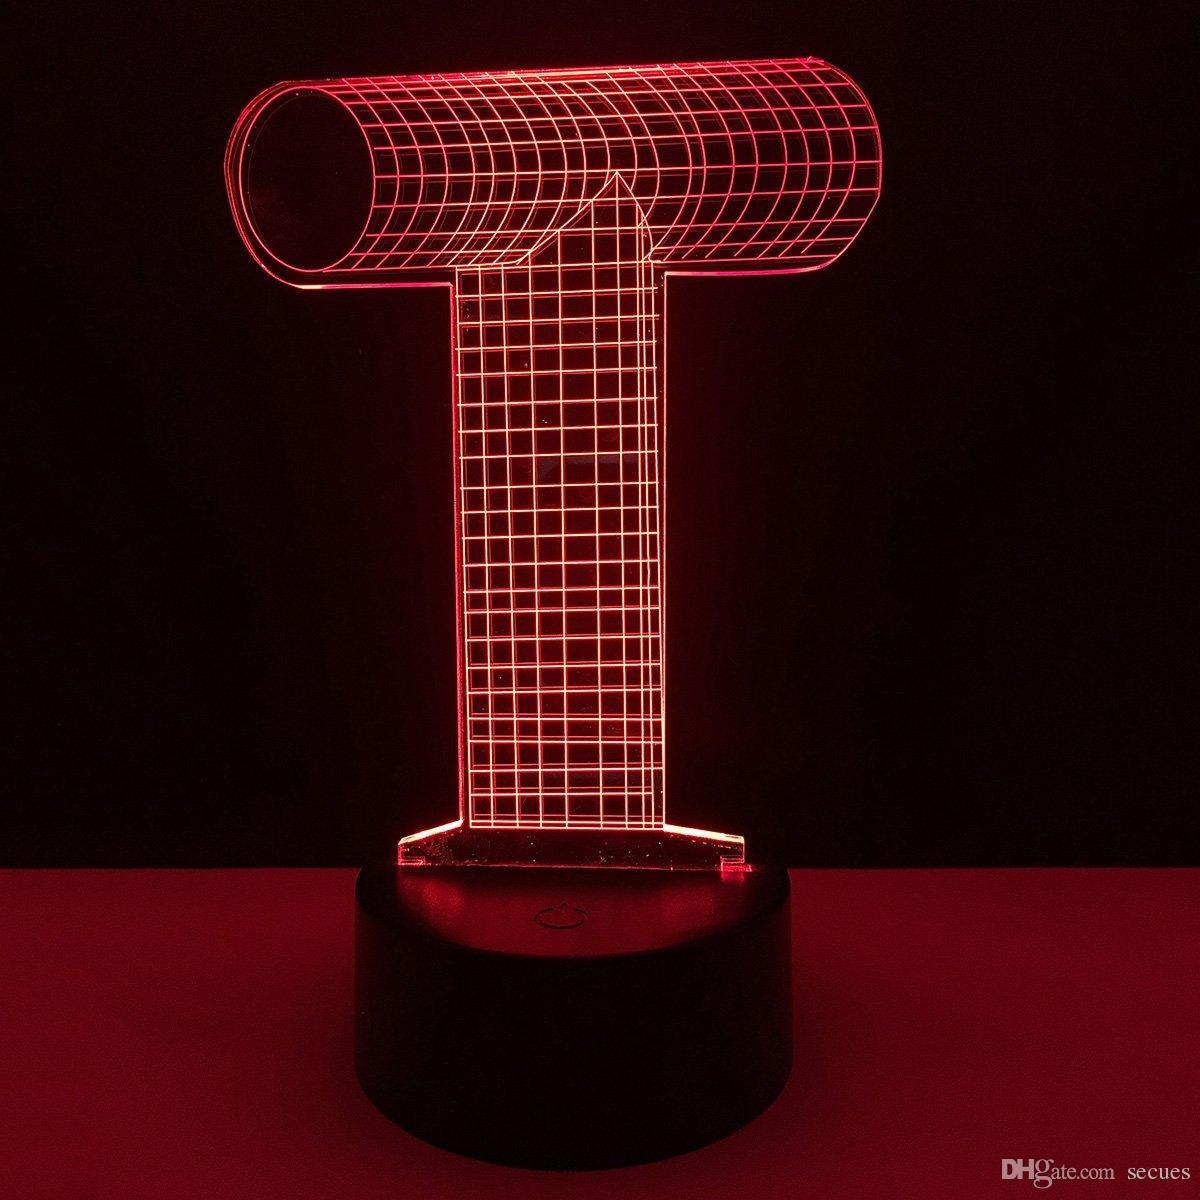 New T Letter Design 3D Illusion Optical LED Lamp Letters Decoration Light DC 5V USB Powered 5th Battery Wholesale